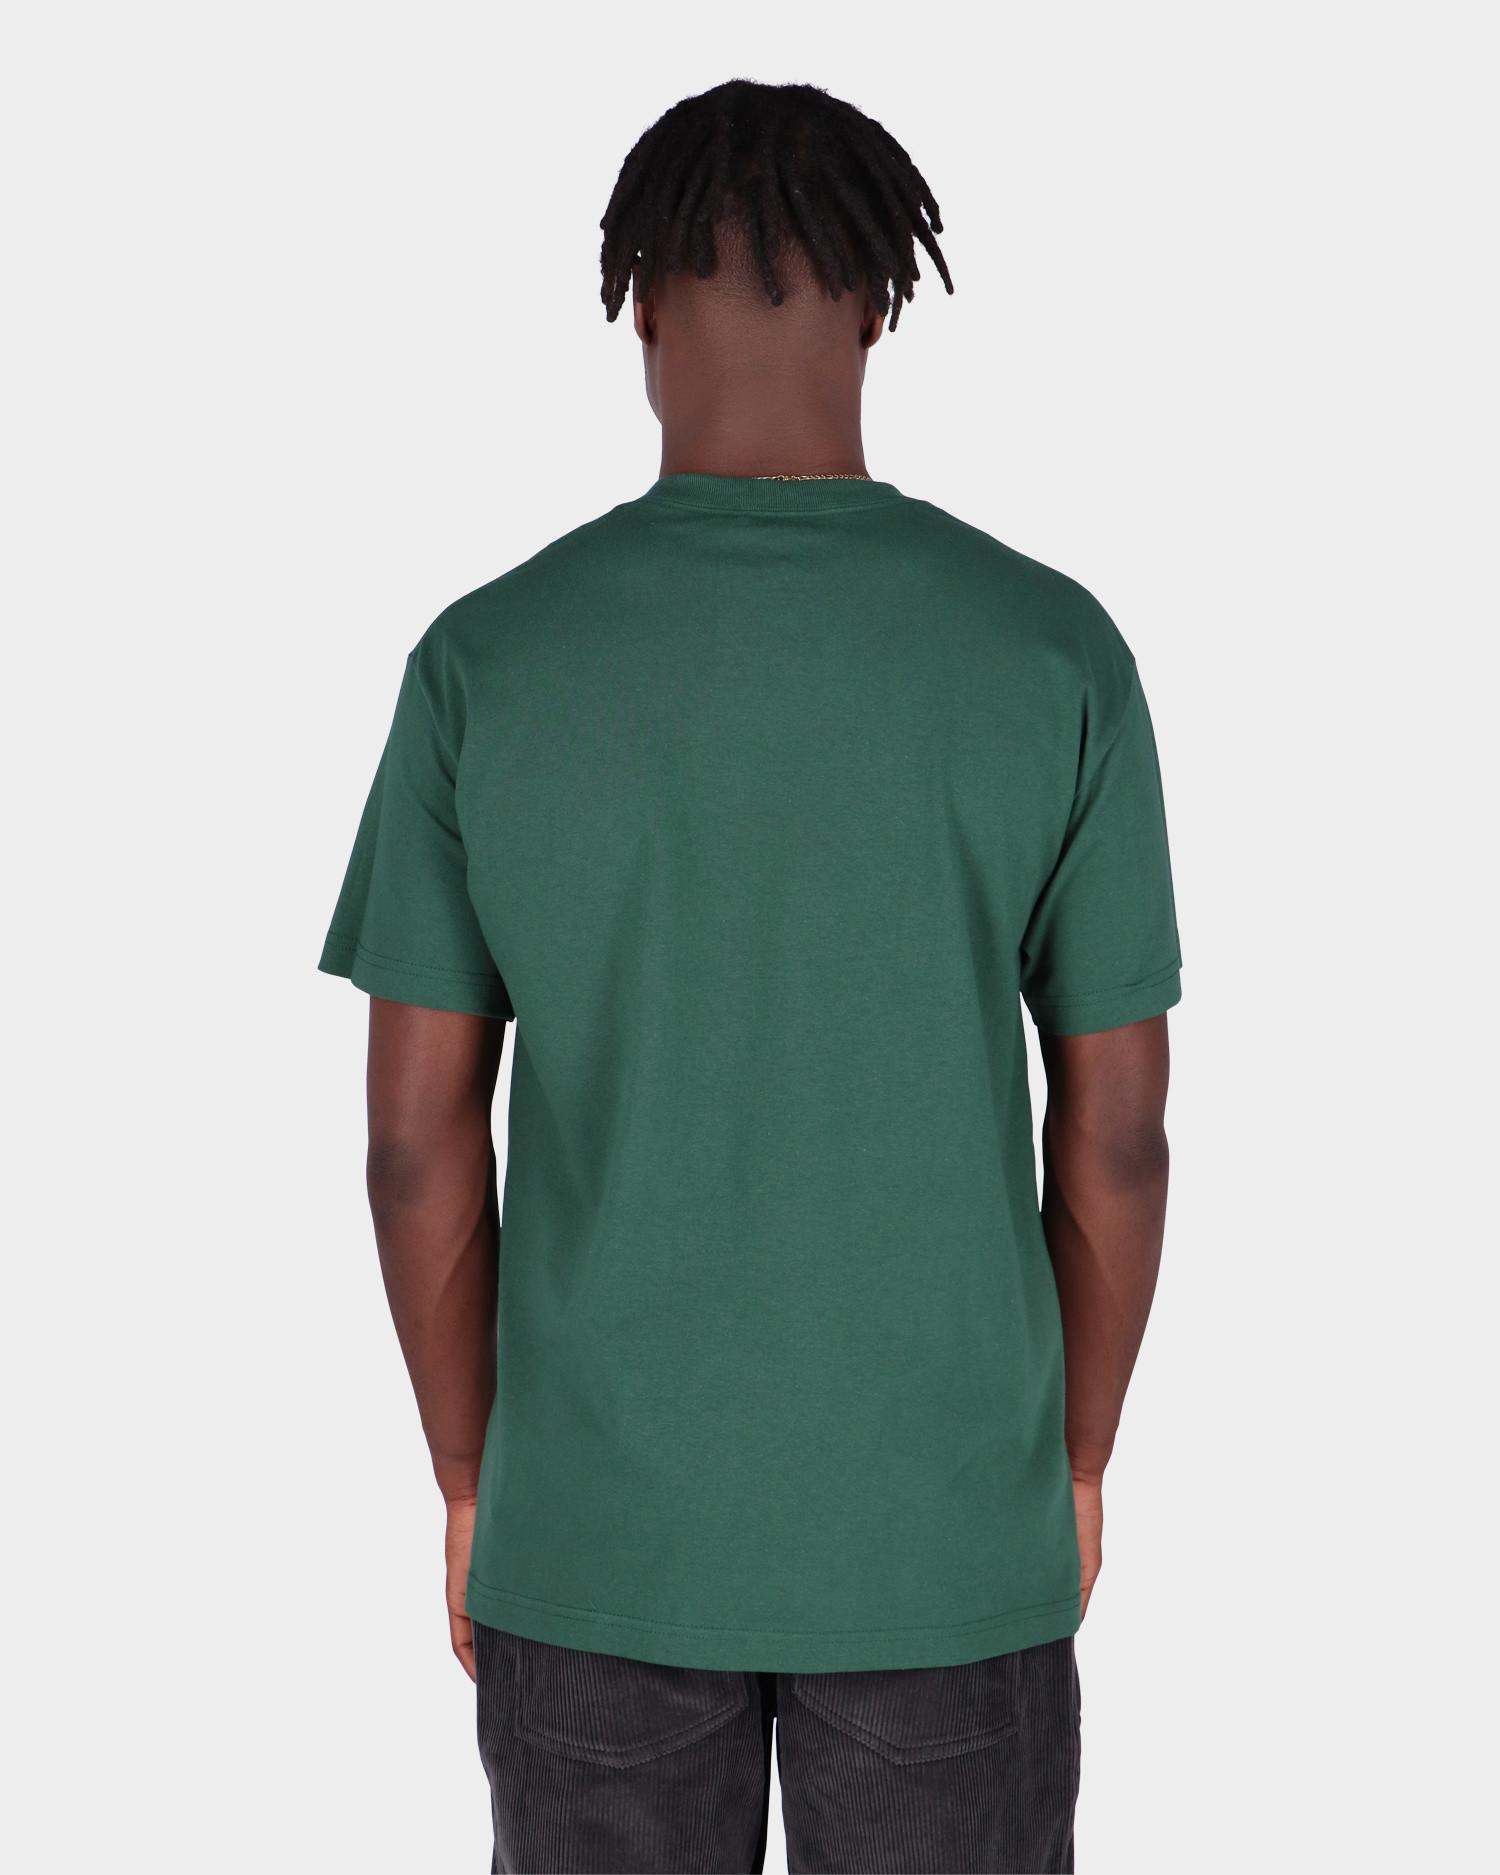 Evisen Sushi Stitch T-shirt Green